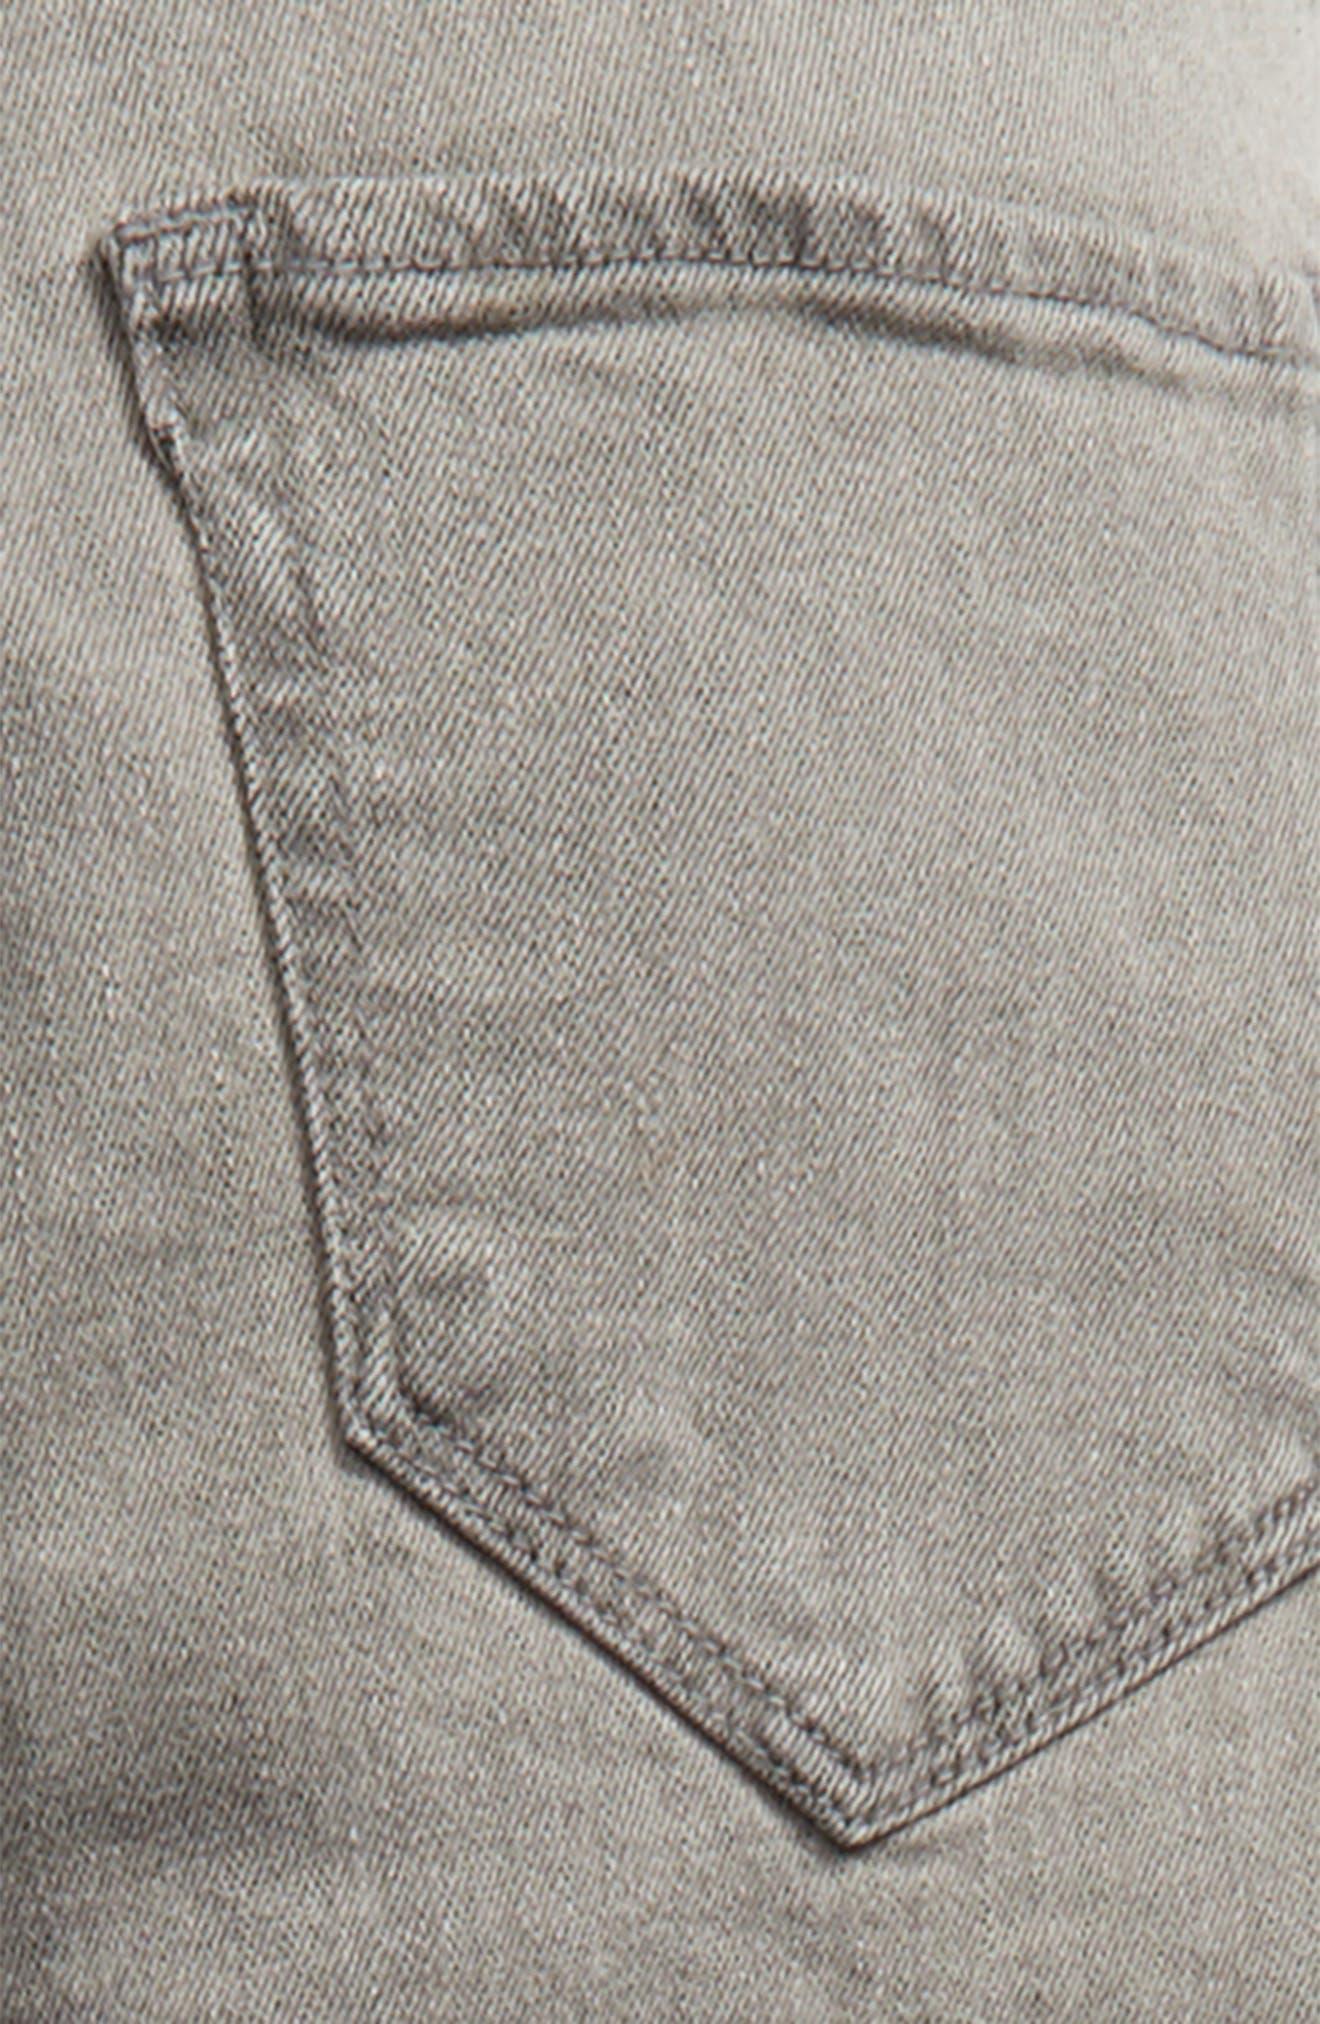 Alternate Image 3  - Treasure & Bond Slouch Skinny Jeans (Big Boys)